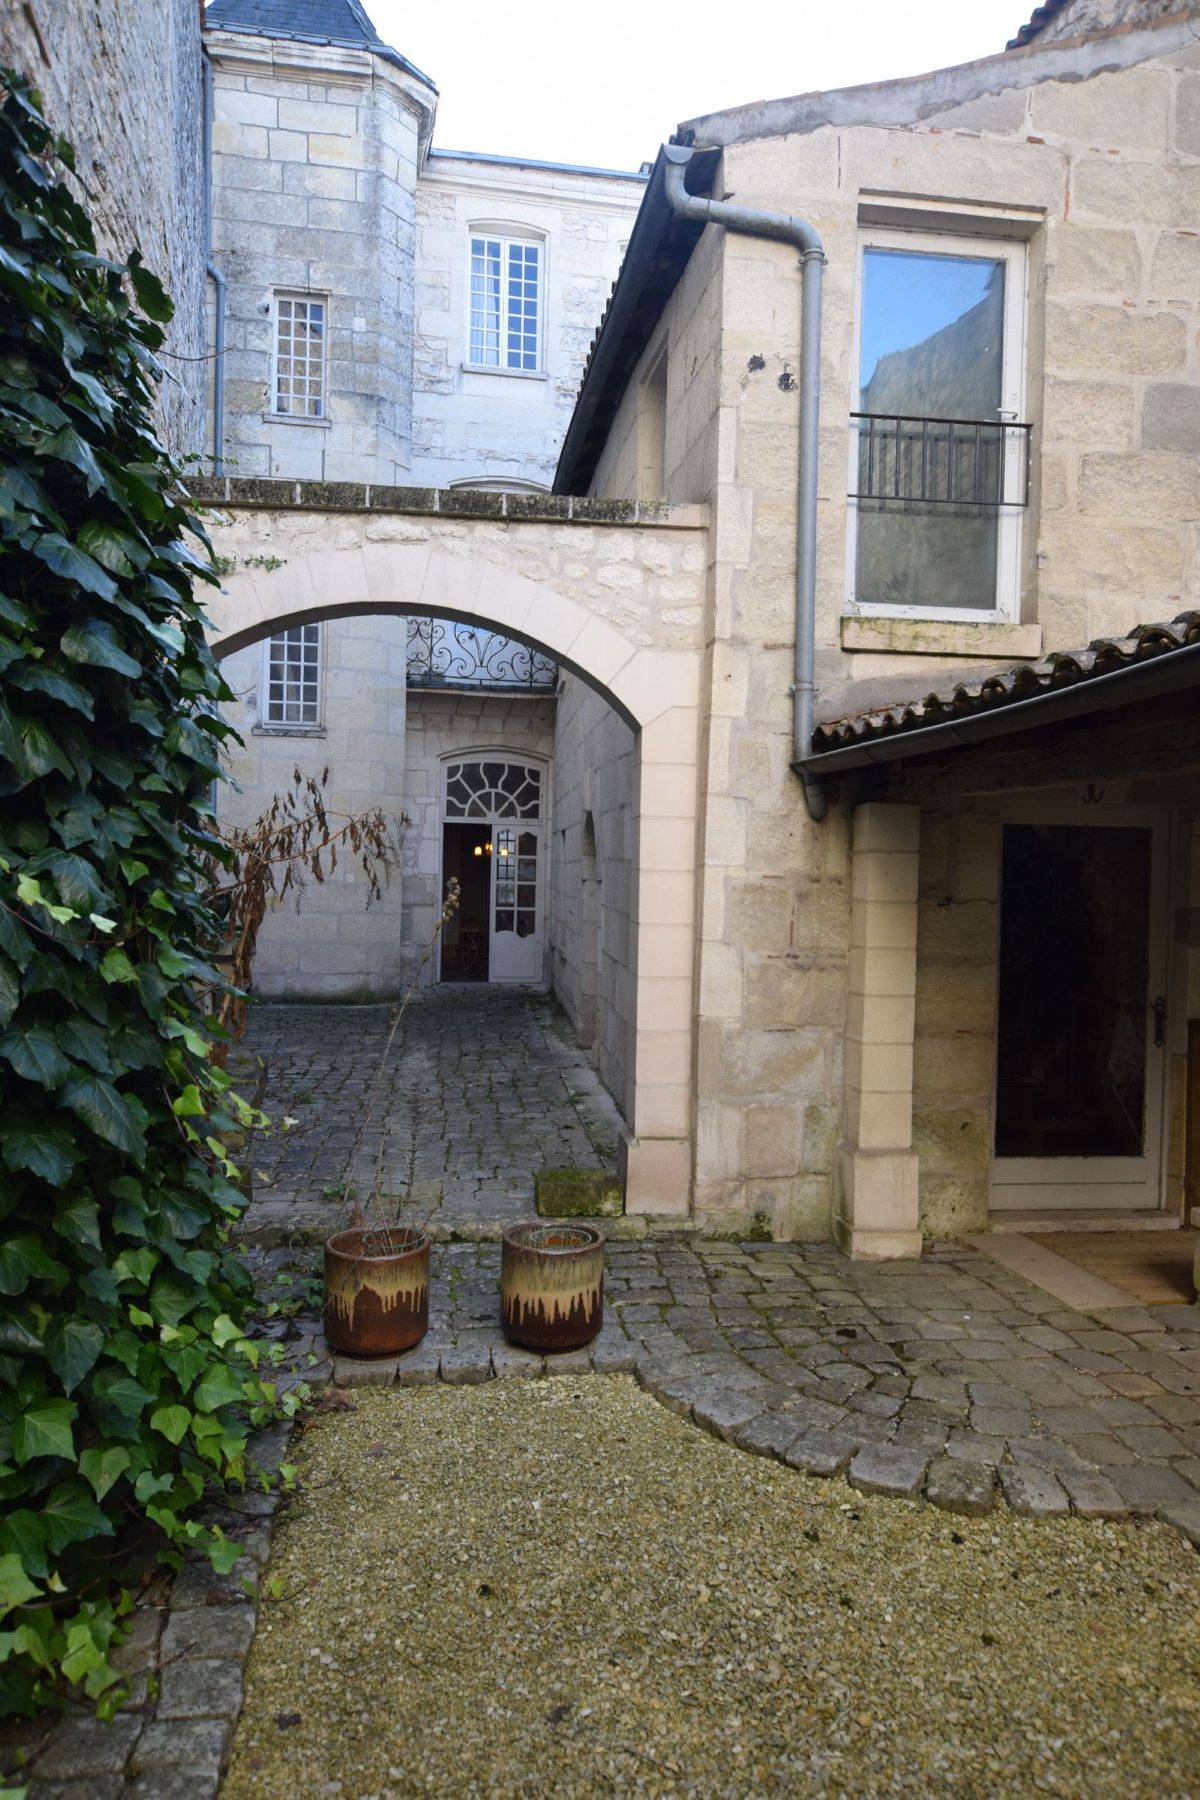 Townhouse for Sale at Town house - center of SAINTES Saintes, Poitou-Charentes, 17100 France